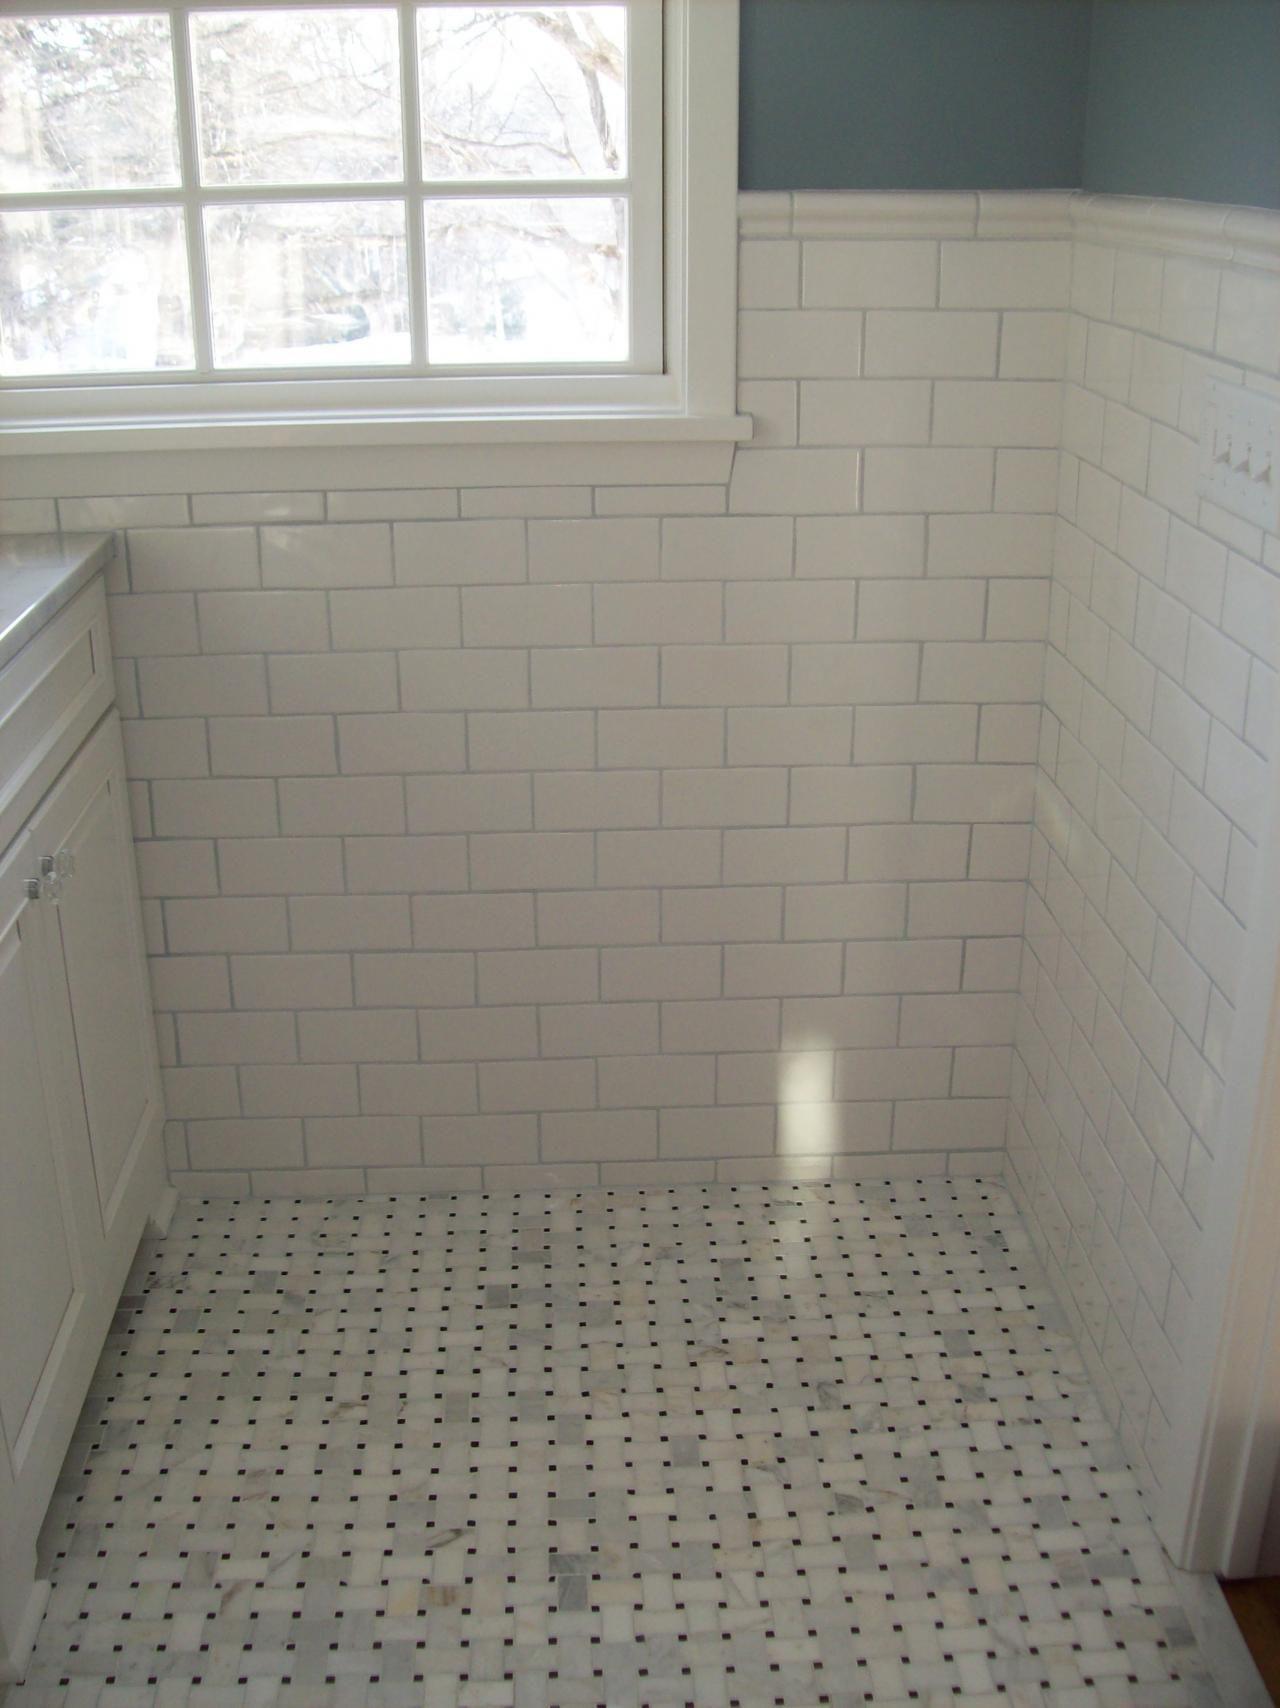 Image of installing tile wainscoting kids bathroom pinterest image of installing tile wainscoting shiifo